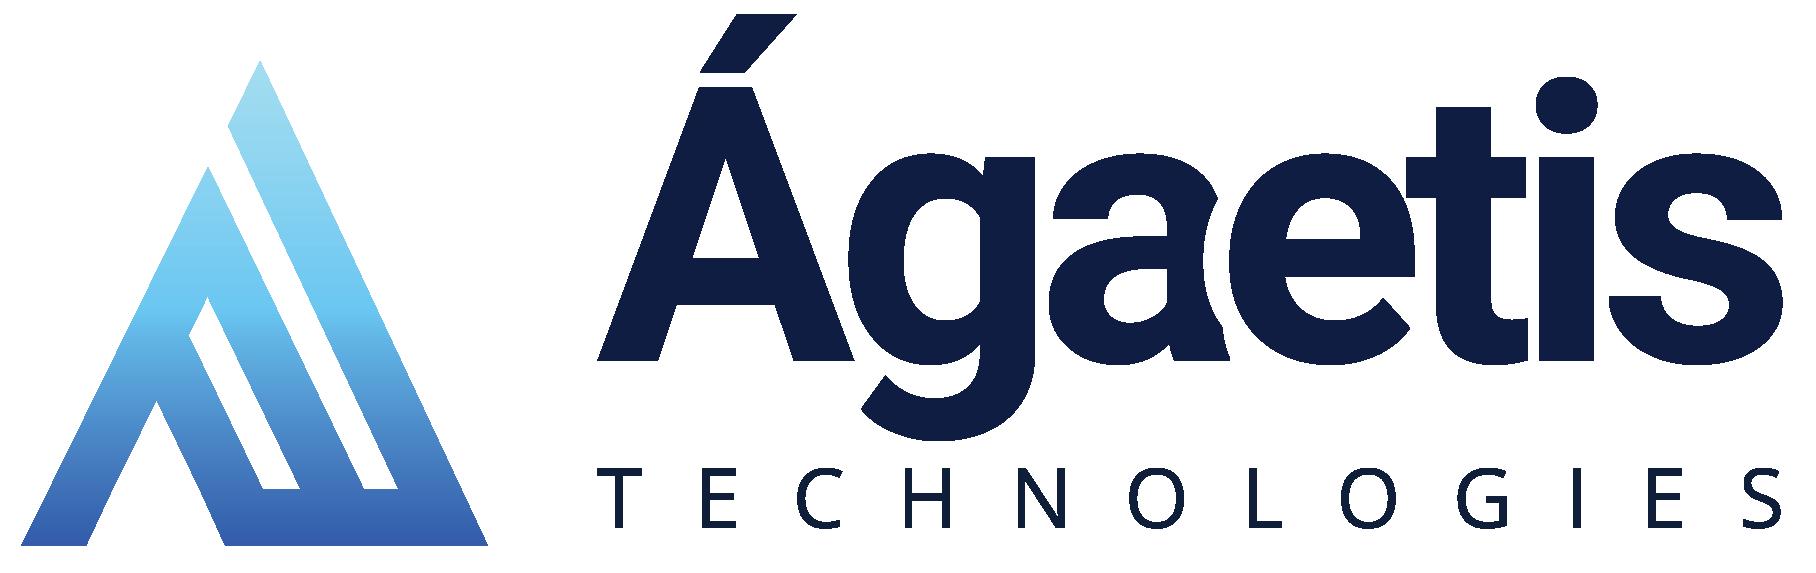 Agaetis Technologies